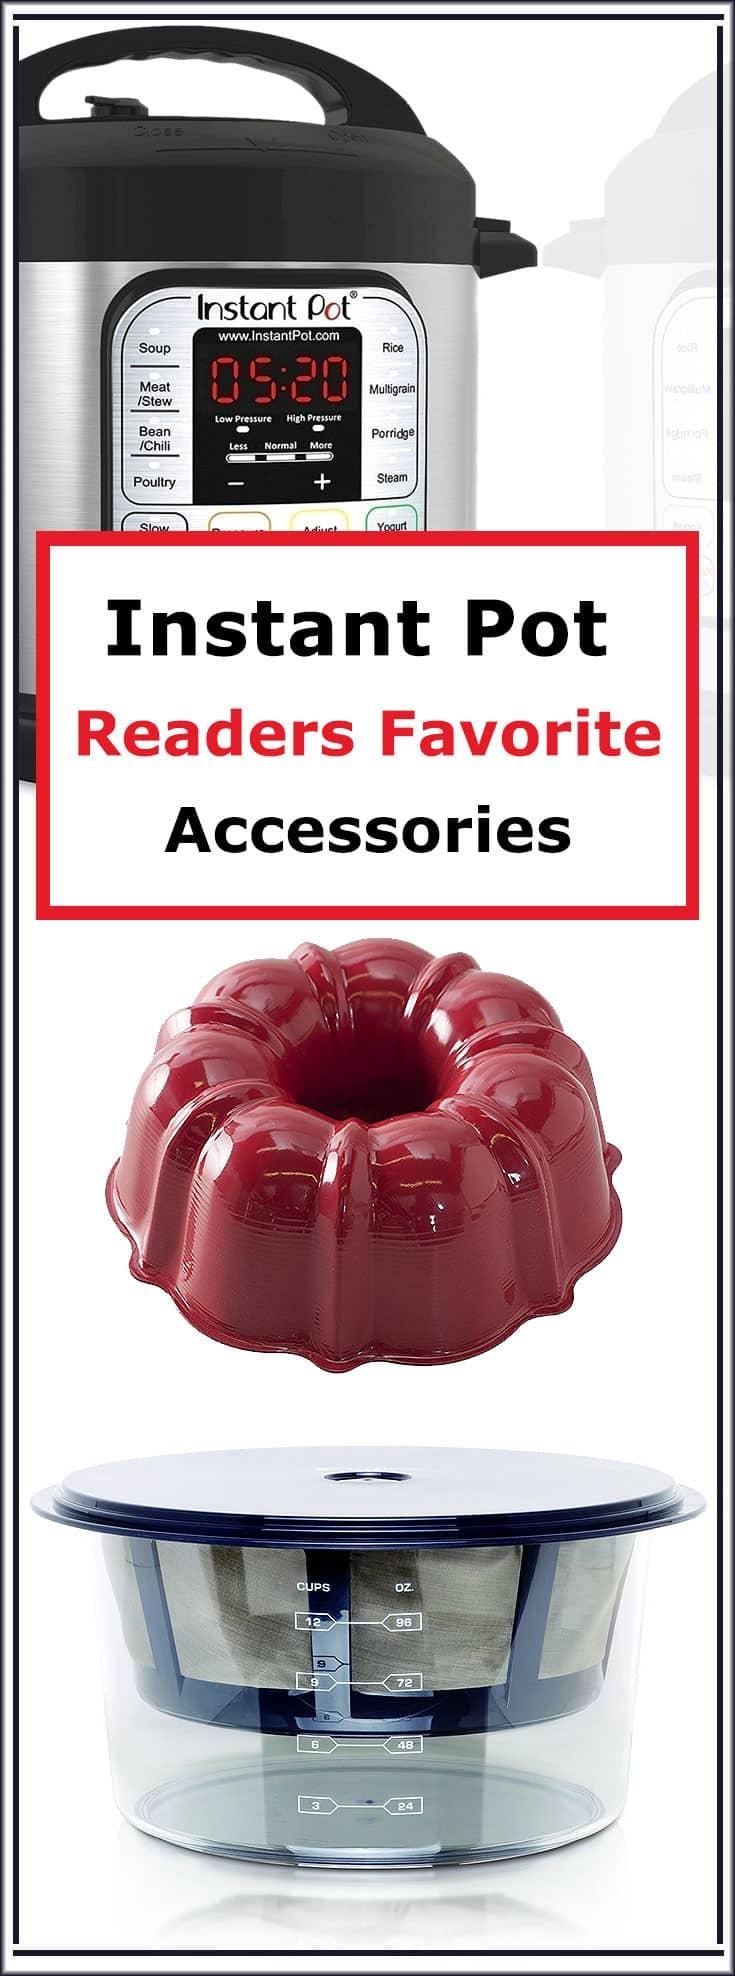 Readers Favorite Instant Pot Accessories